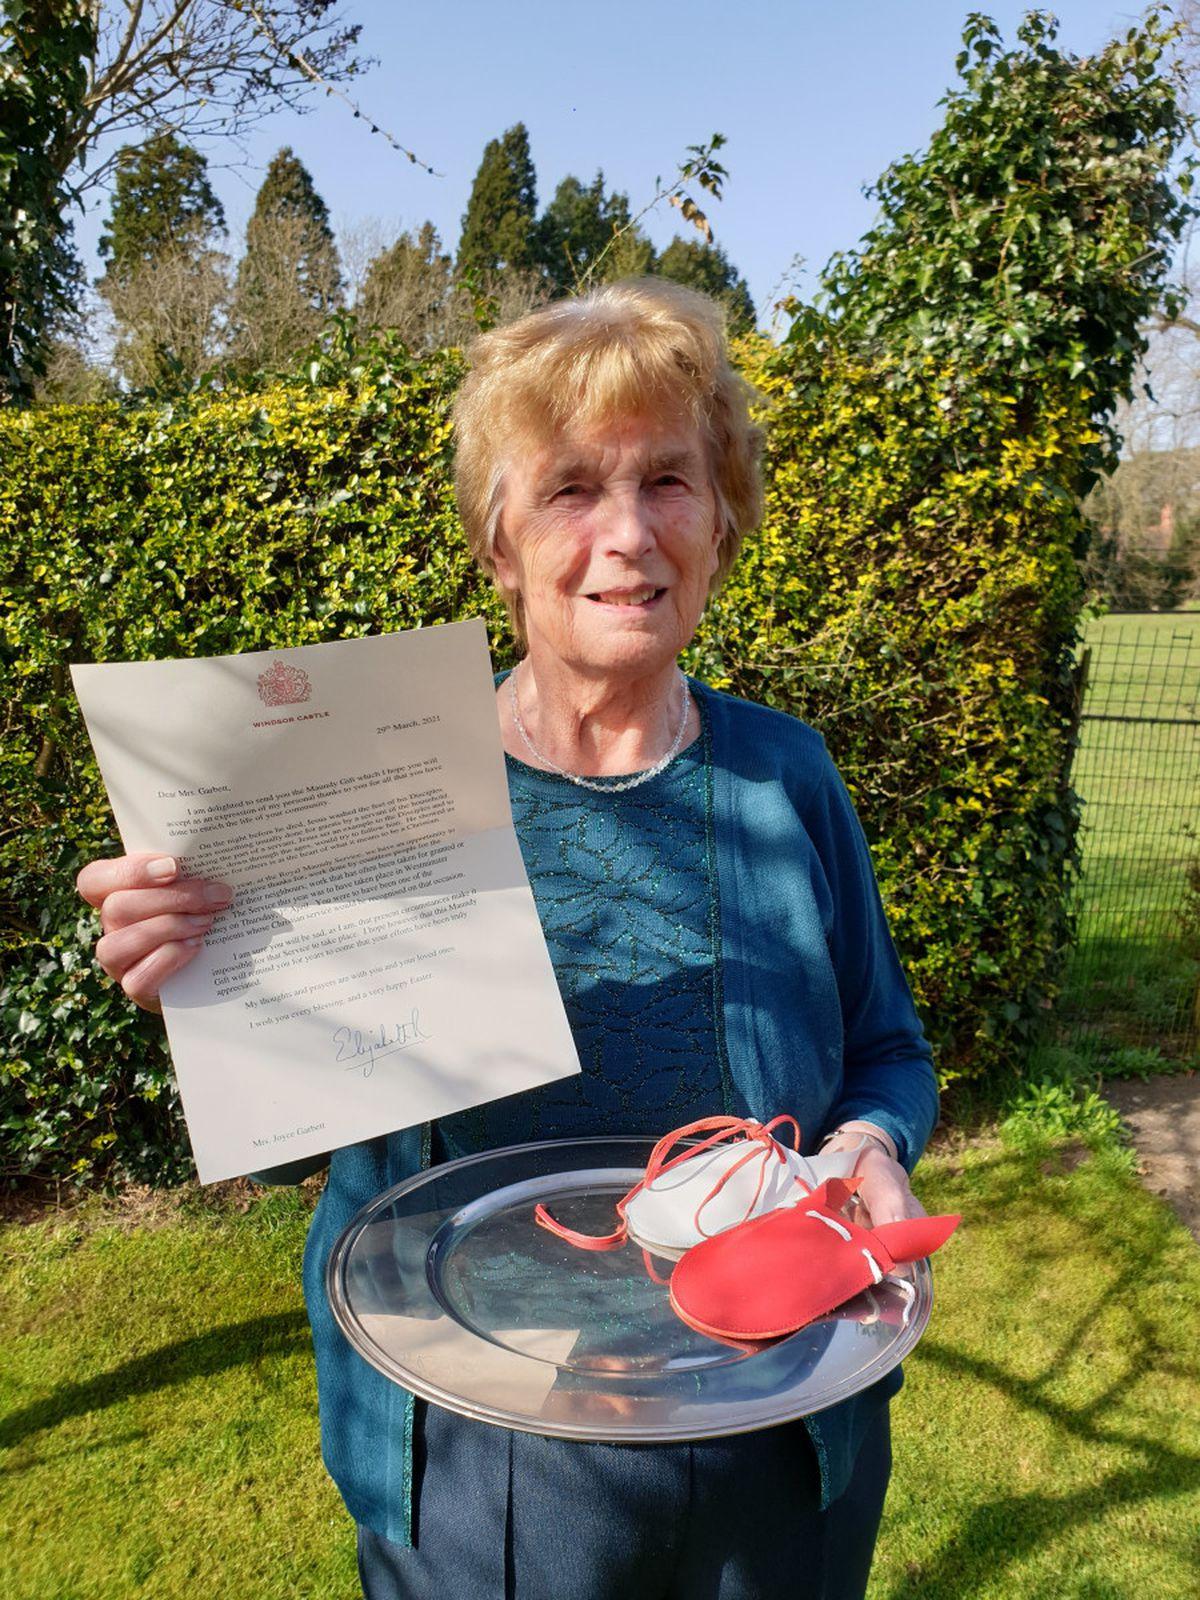 Joyce Garbett said she felt honoured to be part of such a prestigious event